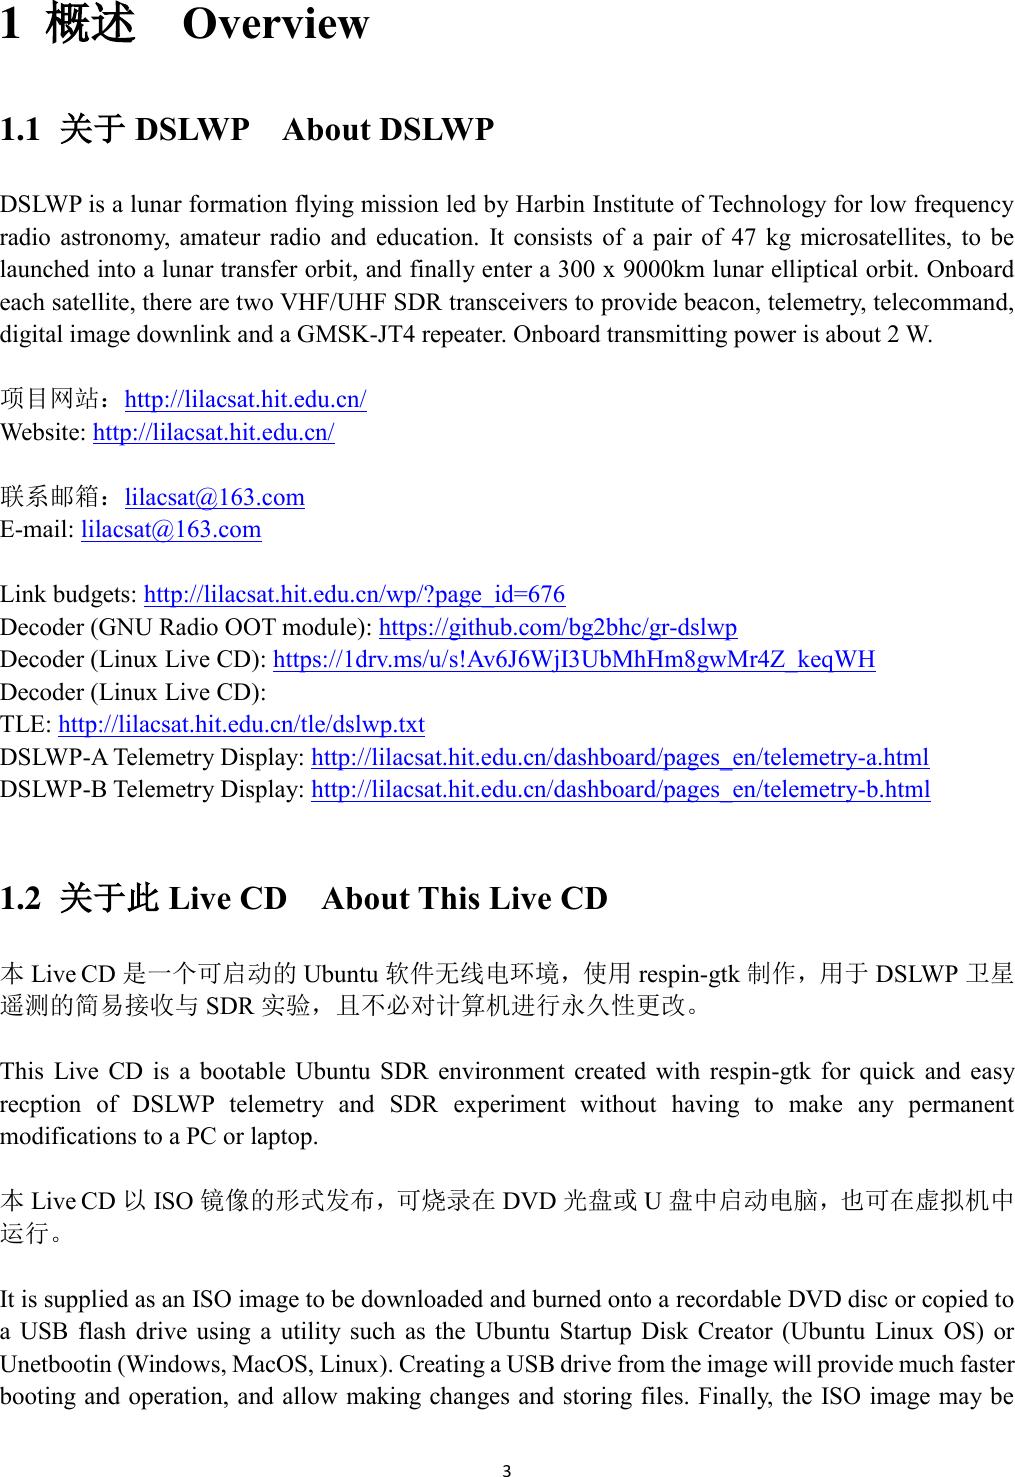 DSLWP Live CD User Manual 20180520